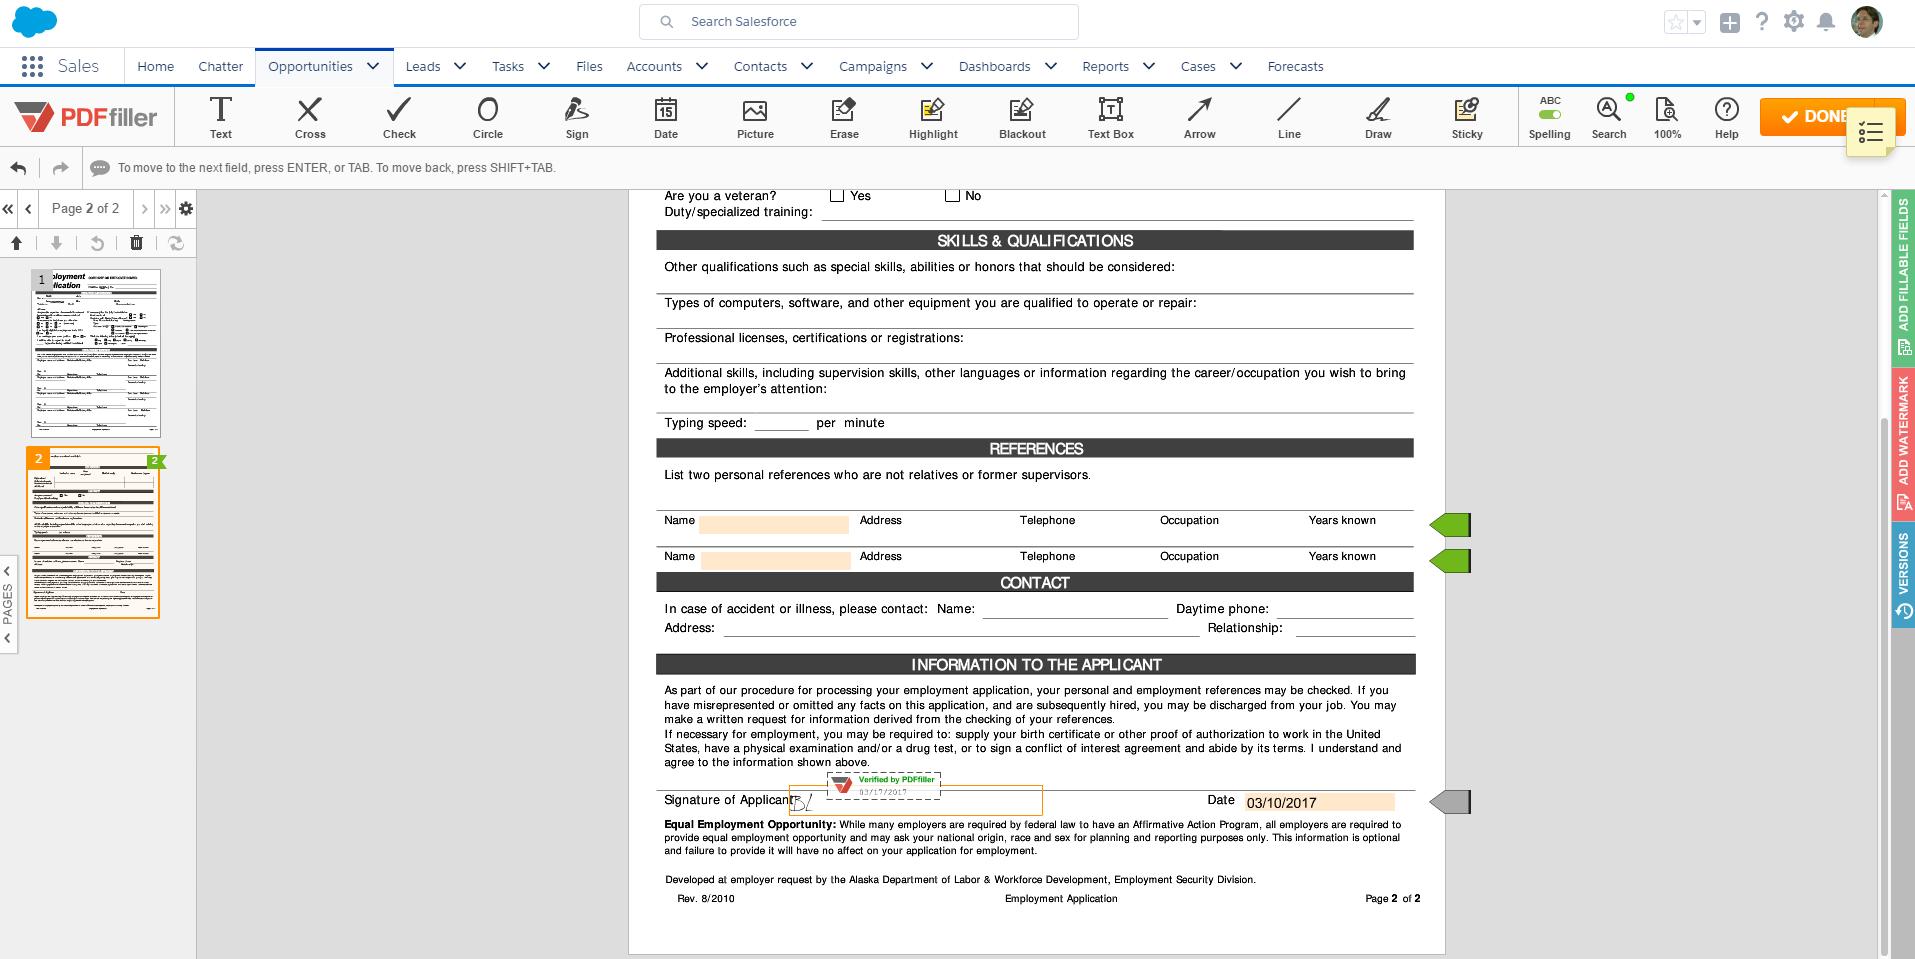 DaDaDocs integrates with Salesforce account